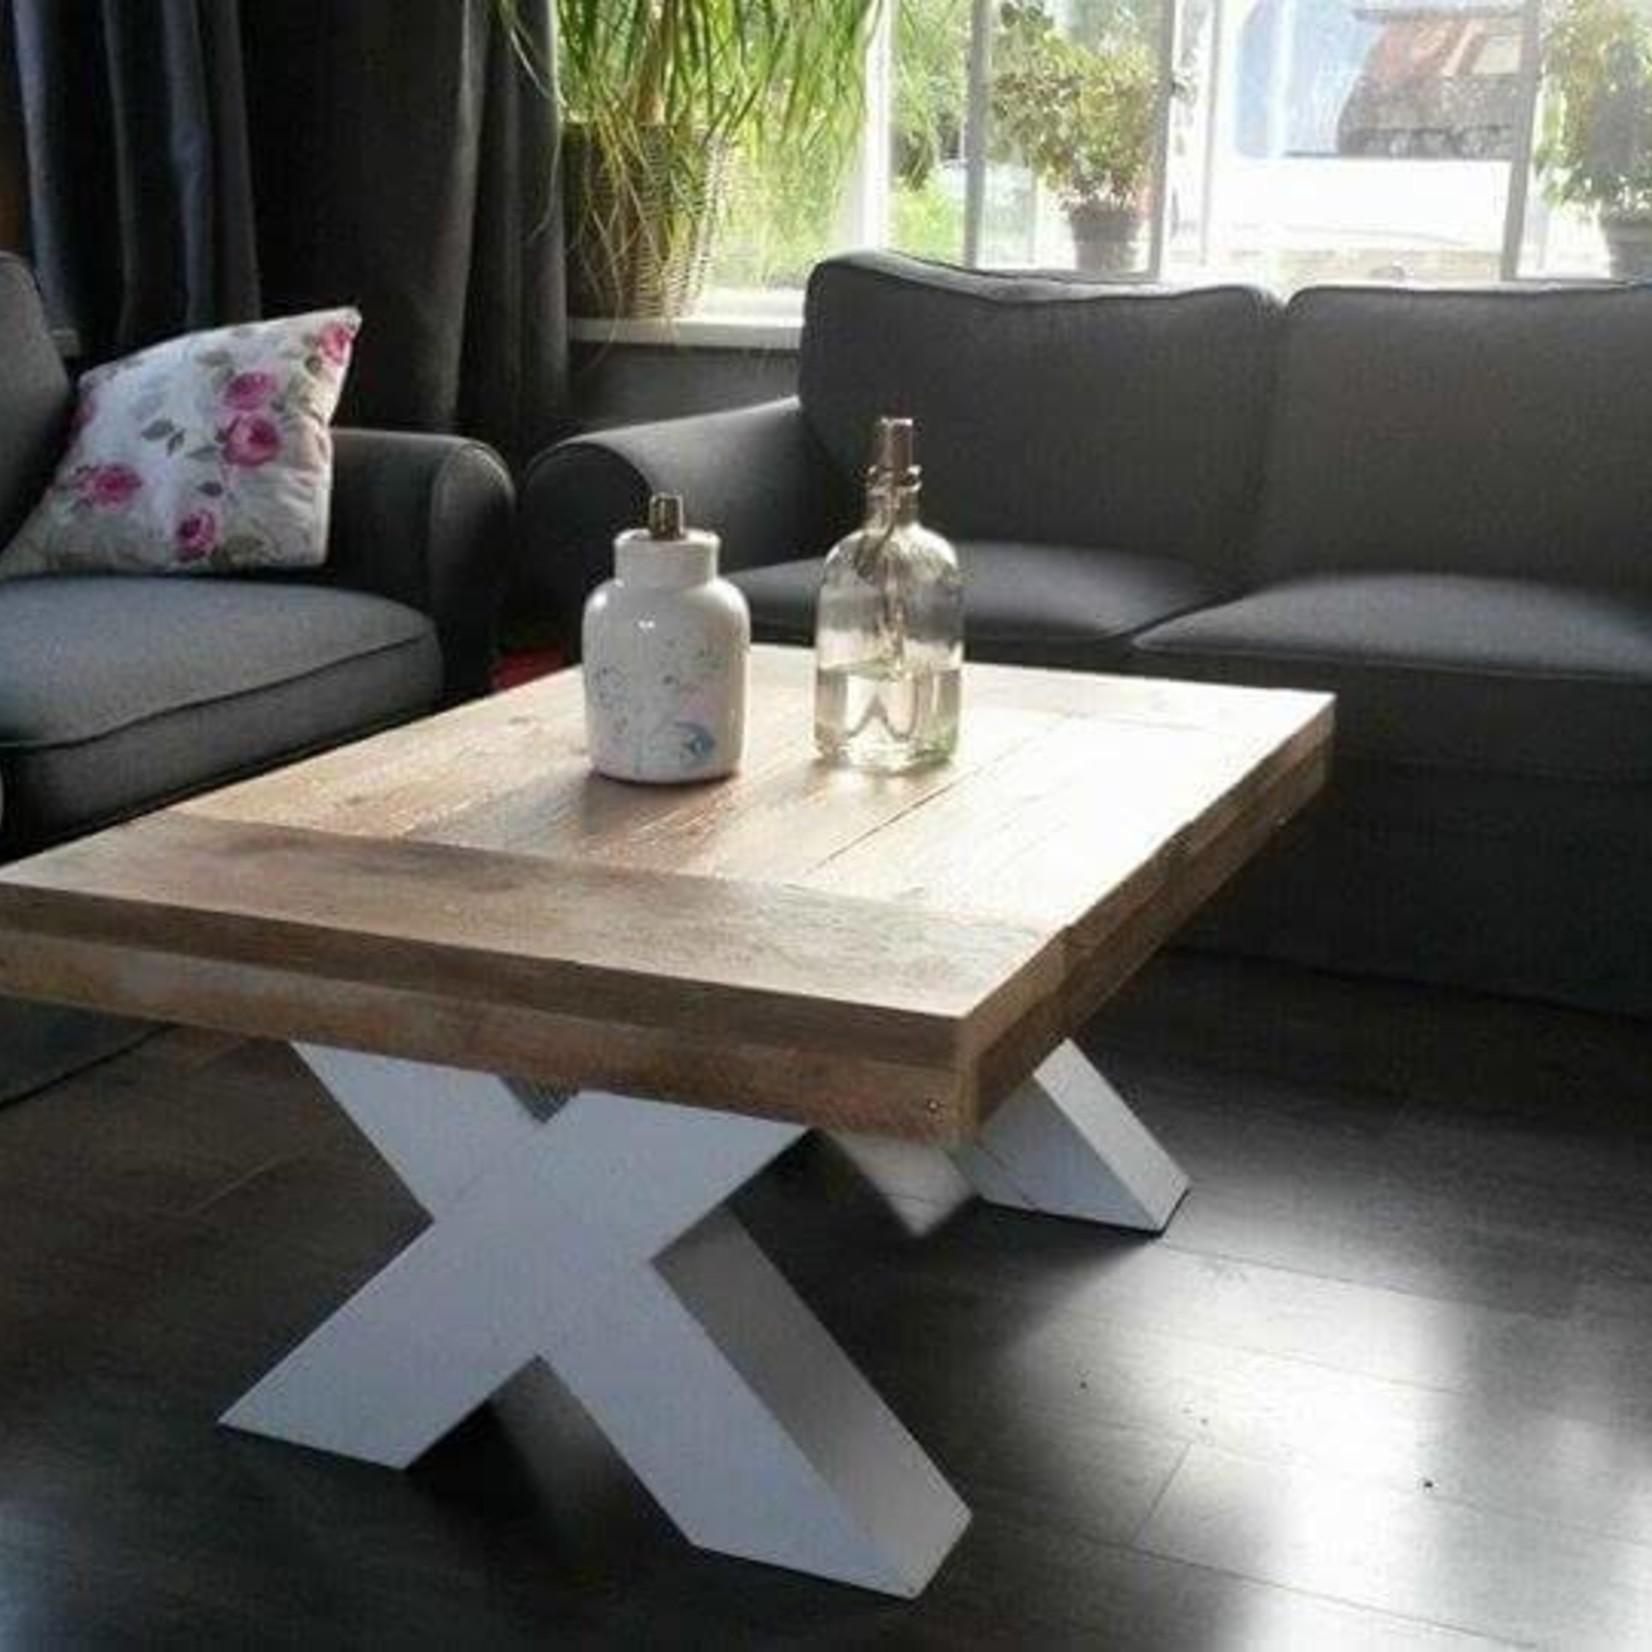 Salontafel 80 cm breed tot 150 cm lang, Houten X poten